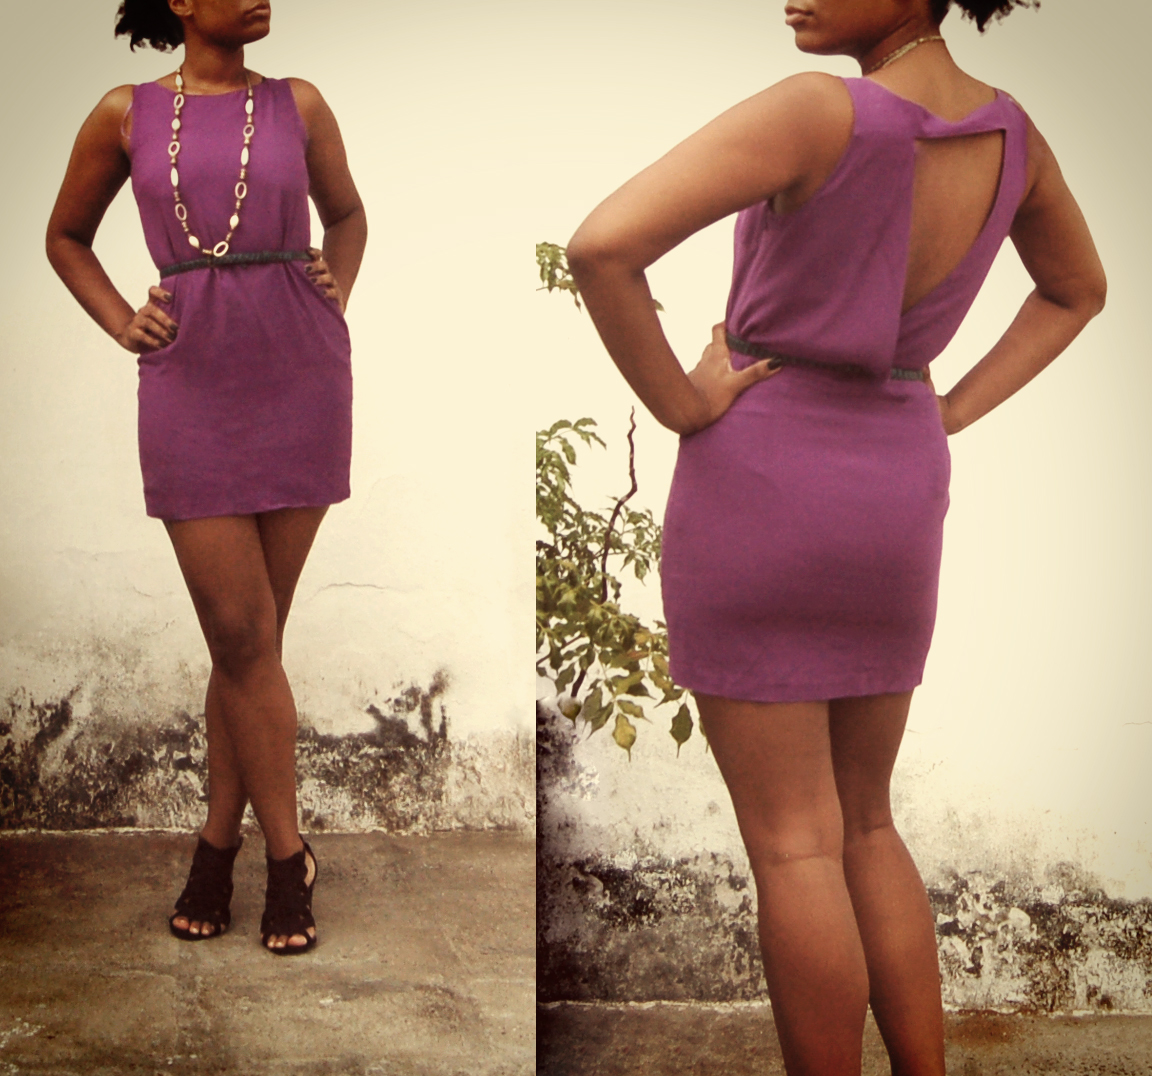 Dress, Zara; Belt, Mango; Shoes, Zara; Necklace, Vintage. // Vestido, Zara; Cinto, Mango, Sapato, Zara; Cinto, Vintage.